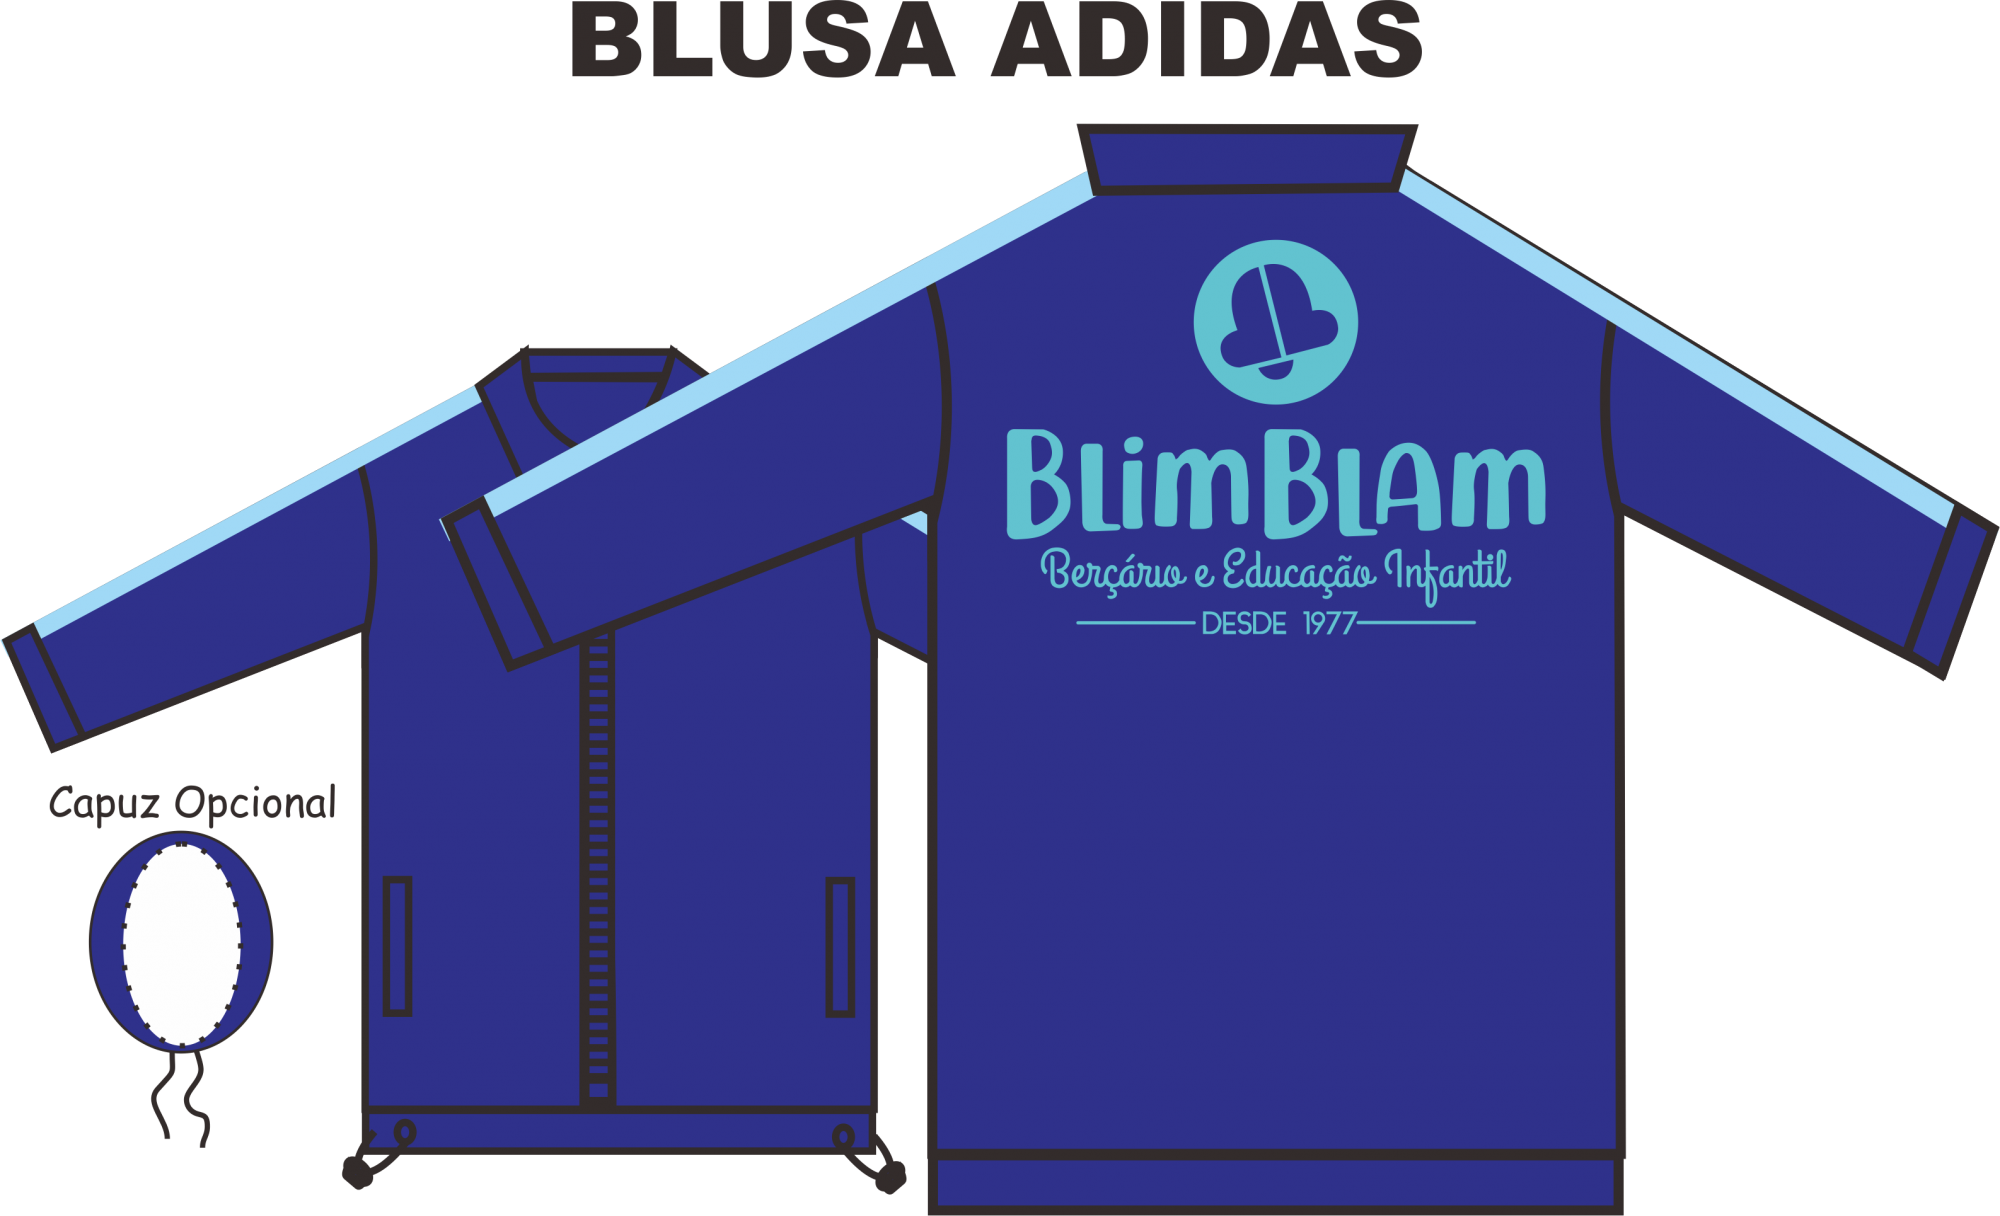 Blusa Helanca Gaucha Adidas Aberta Blim Blam